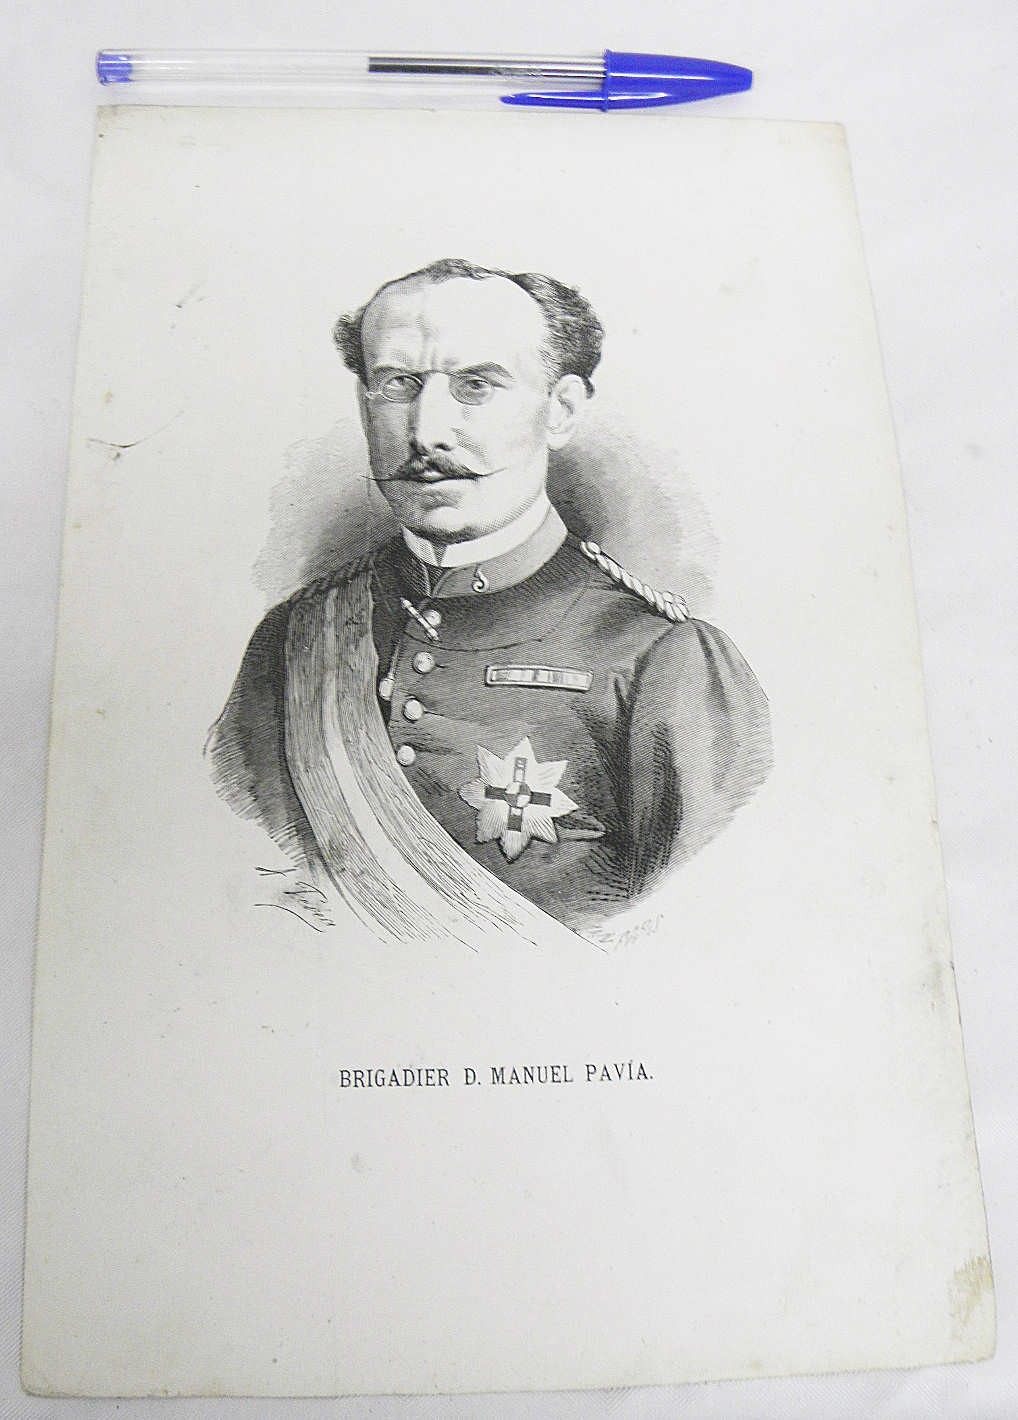 LP-BRIGADIER-D-MANUEL-PAVIA